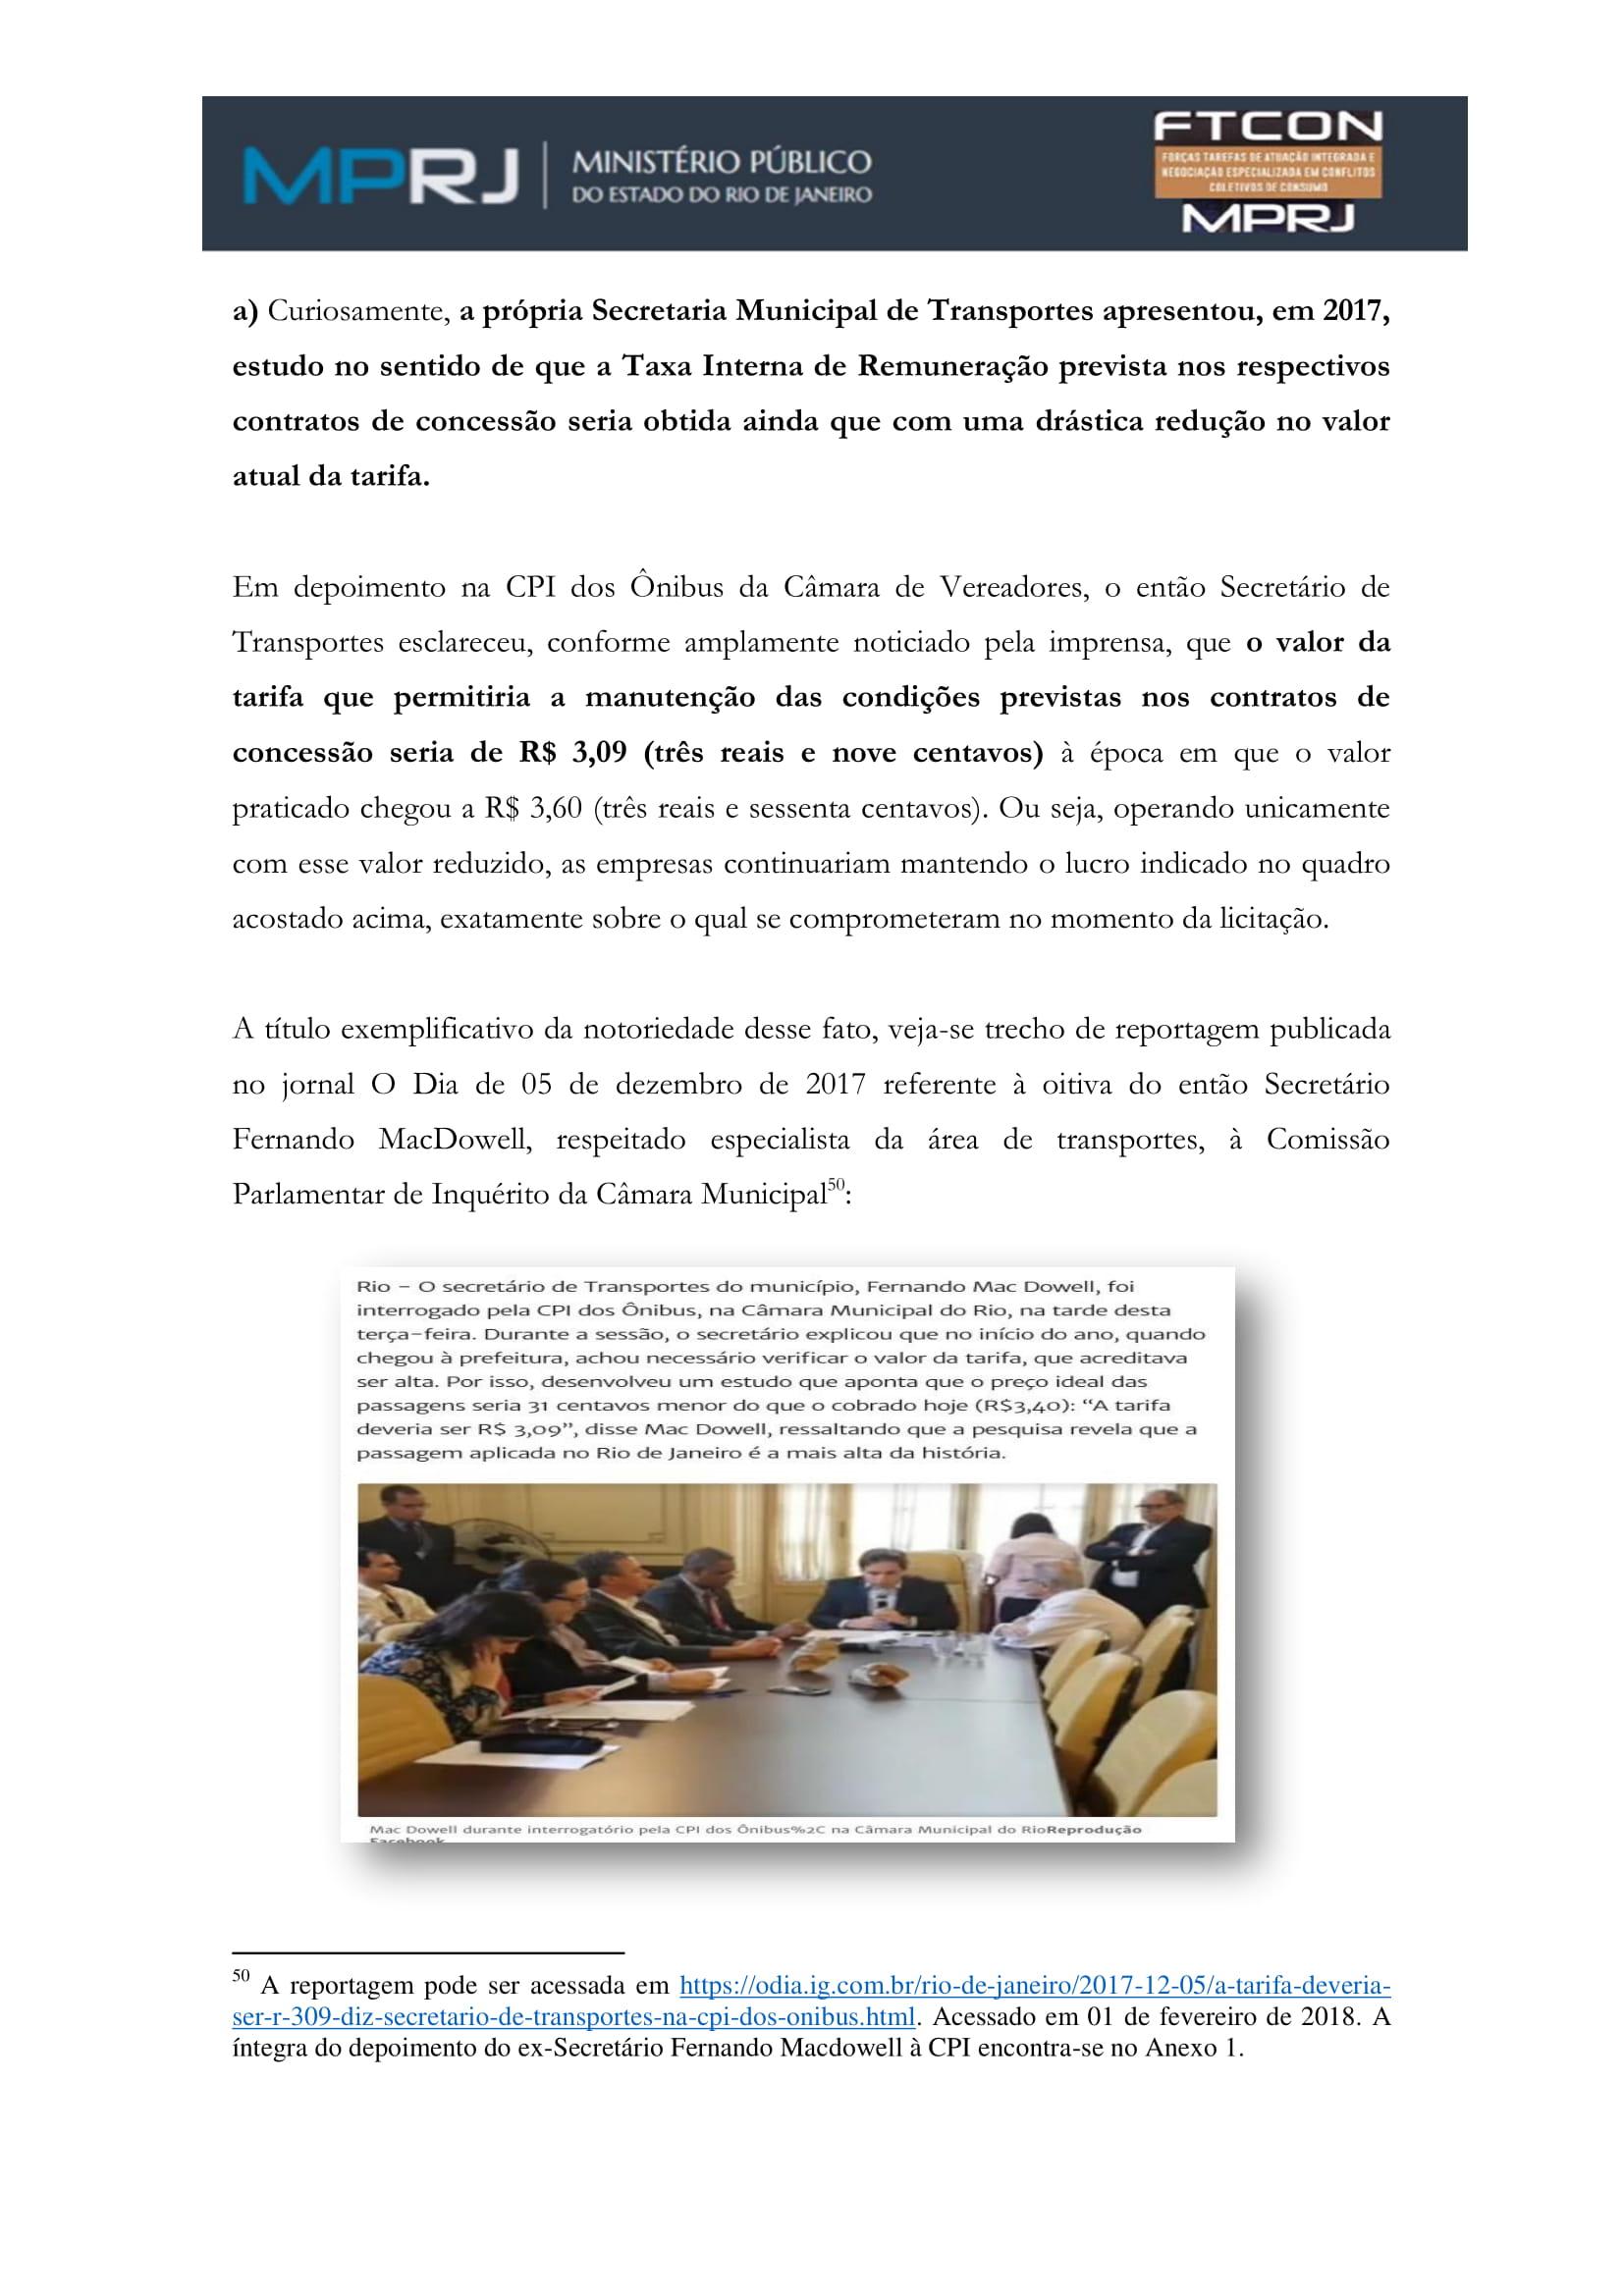 acp_caducidade_onibus_dr_rt-069